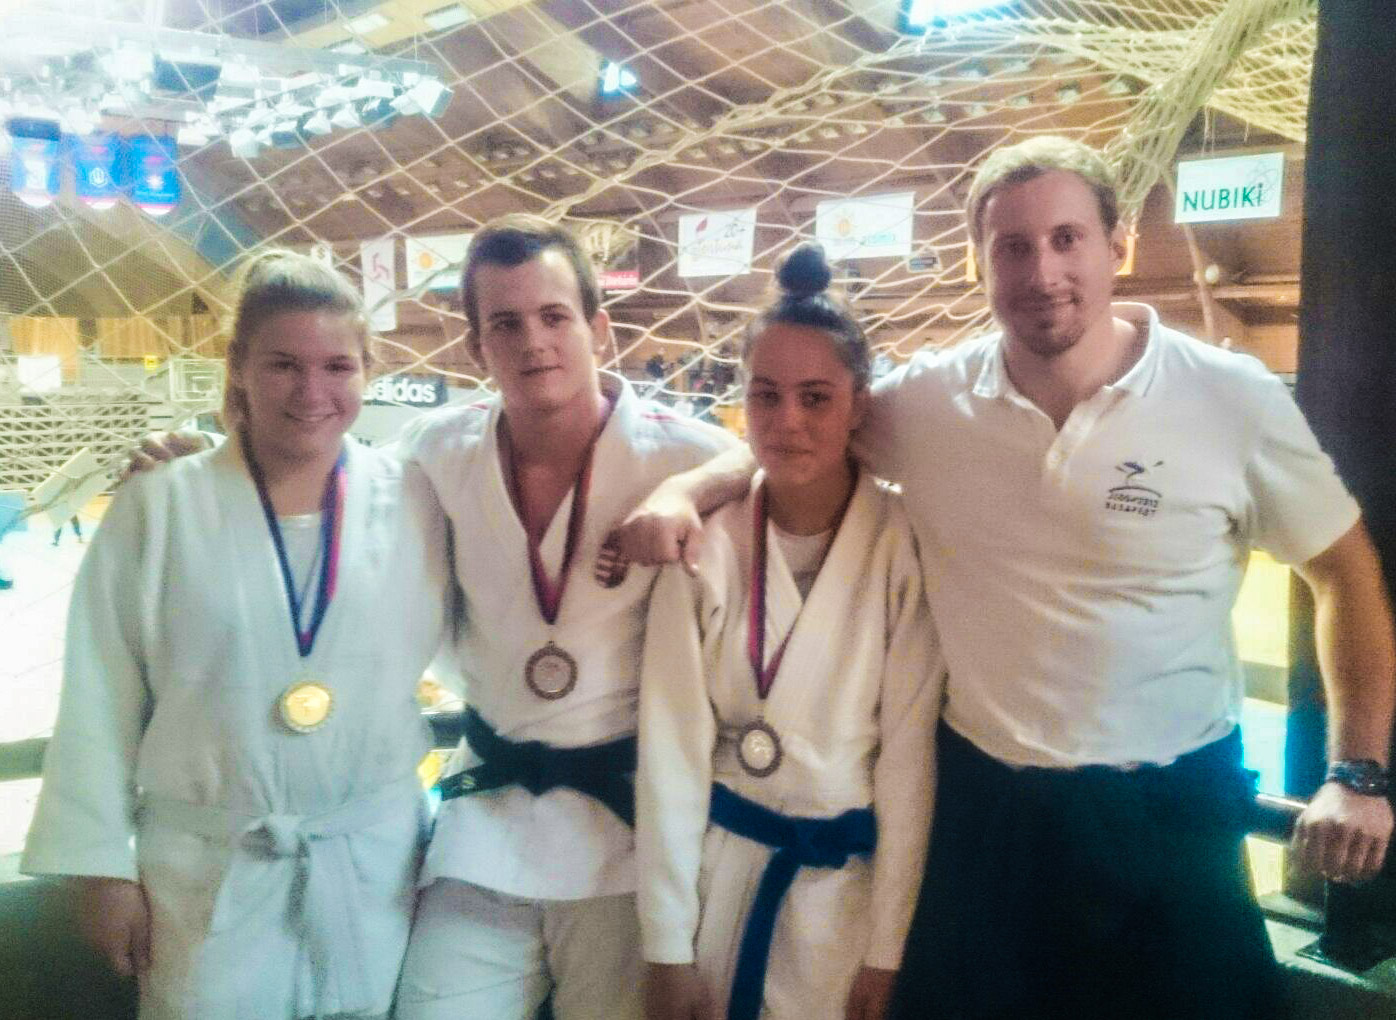 KJC-KESI judosai Pakson